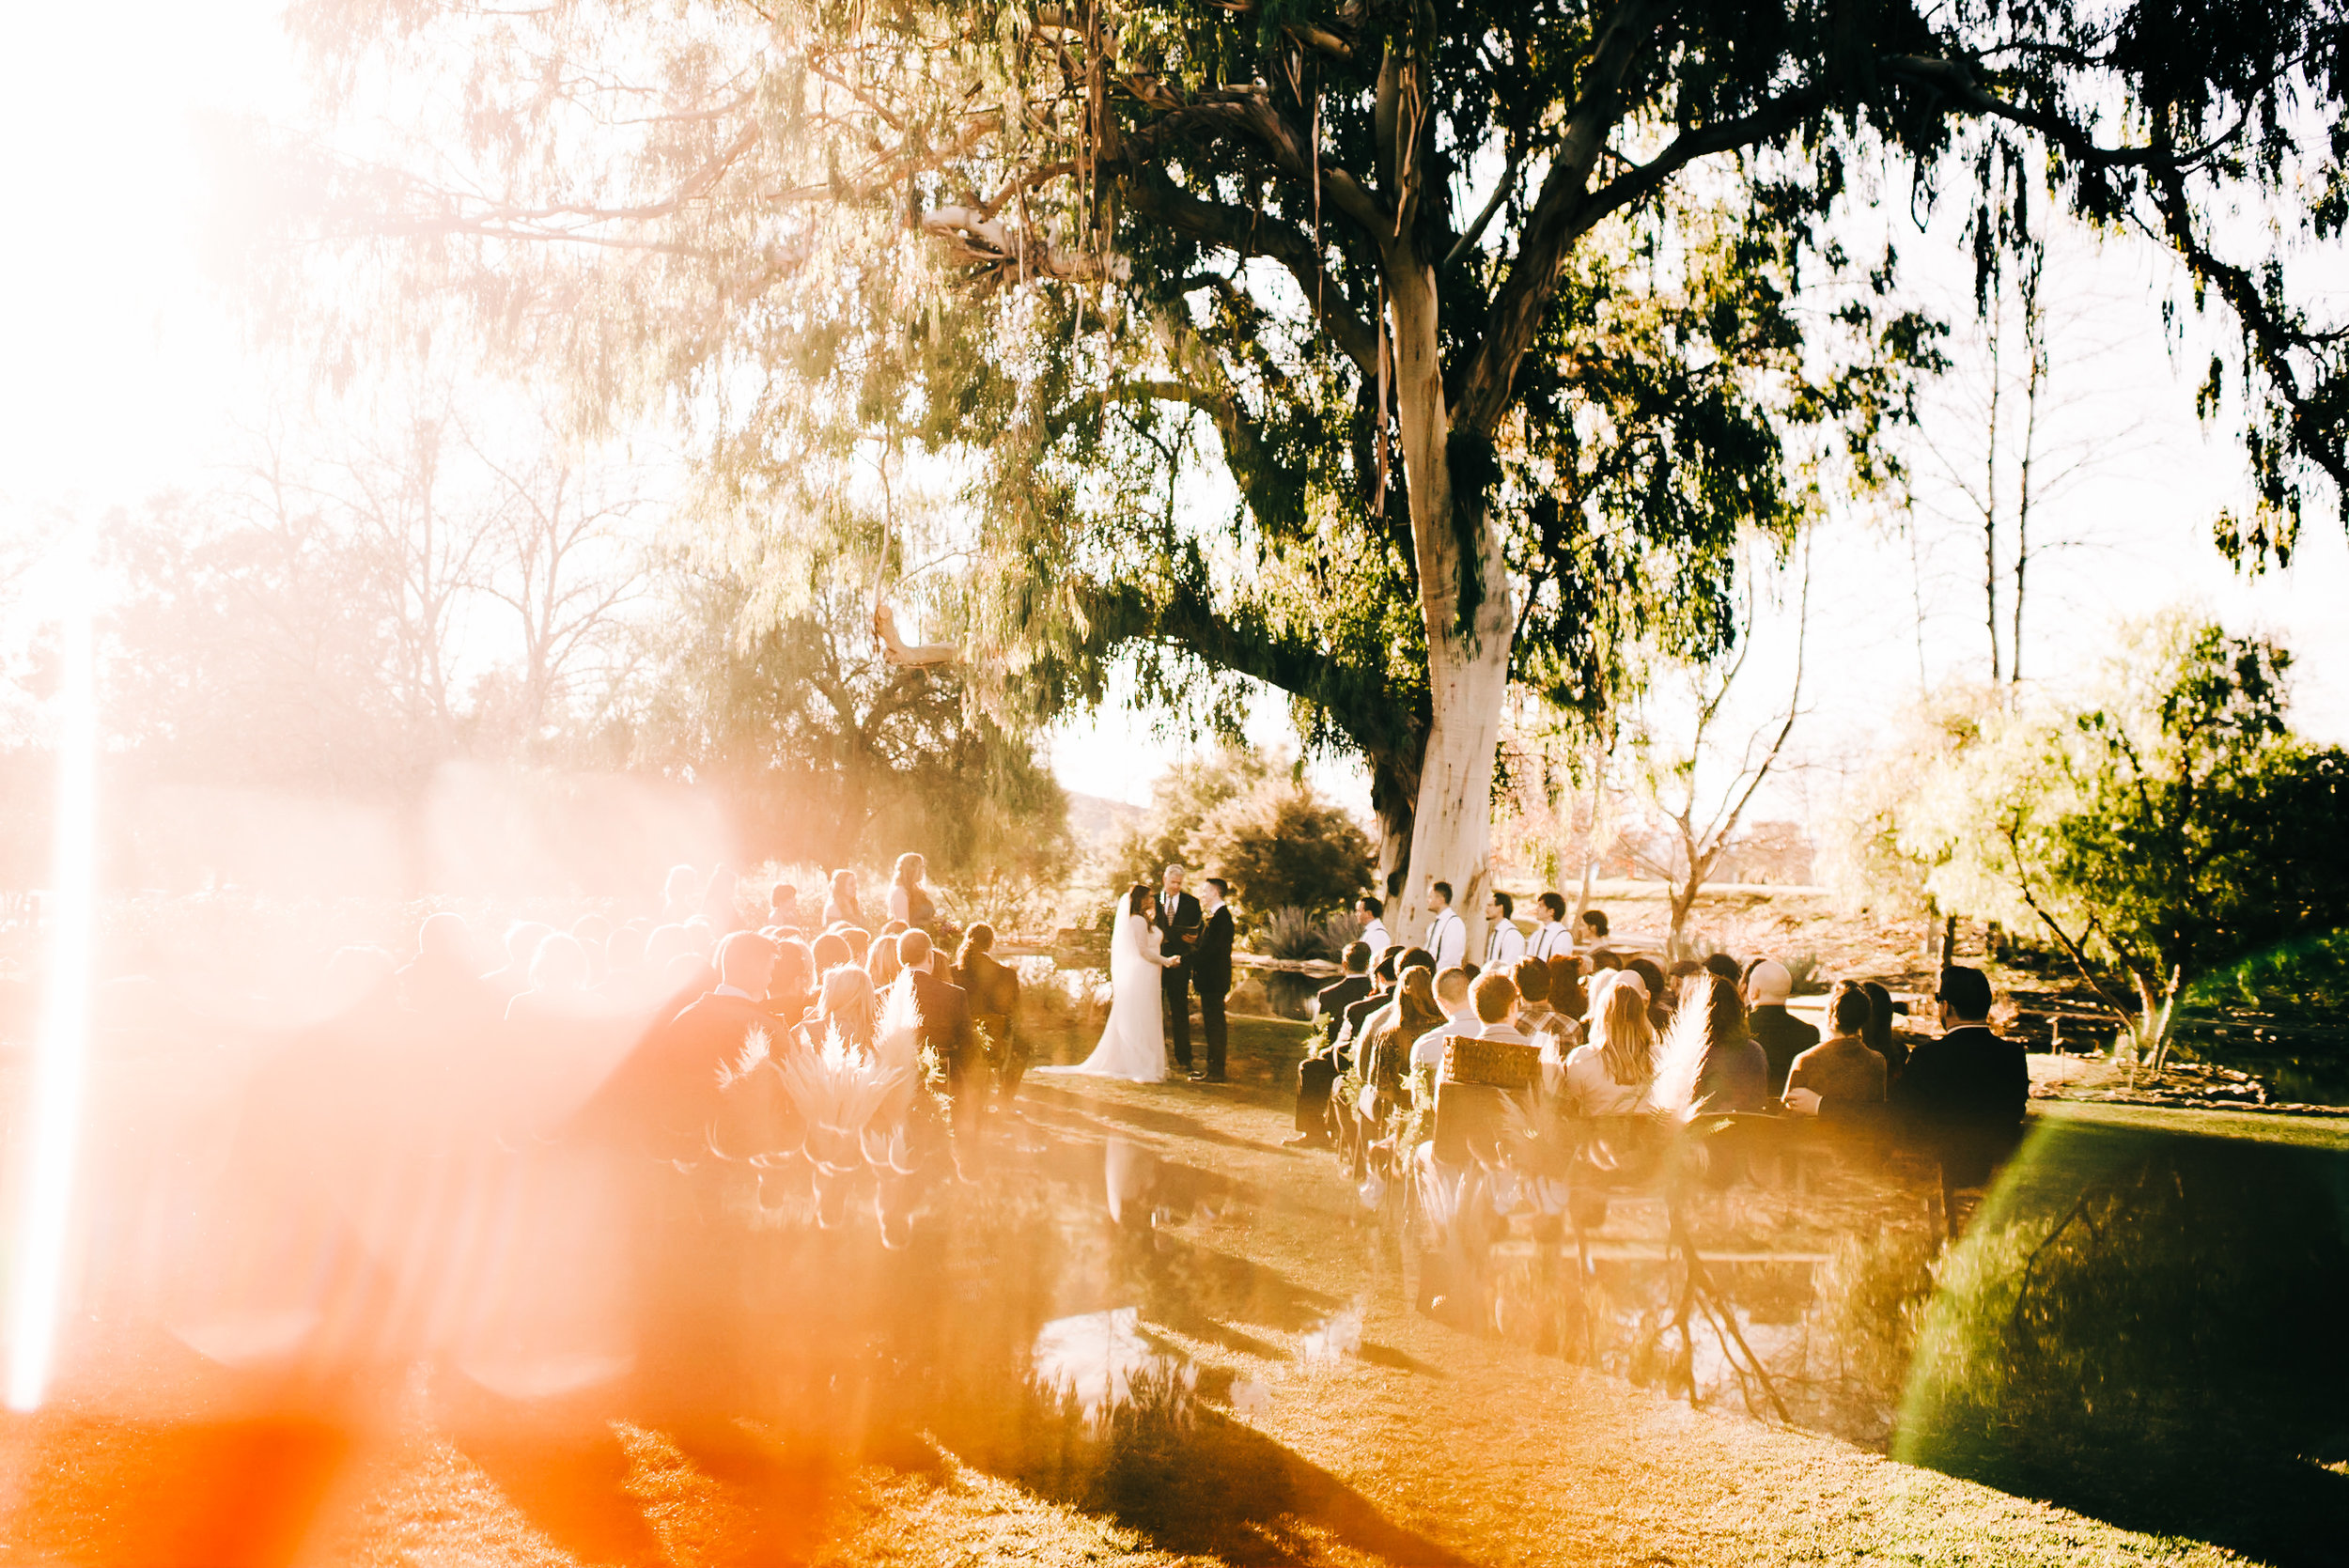 bay area nontraditional wedding photographer southern california boho wedding love light magic san francisco oakland northern california-525.jpg